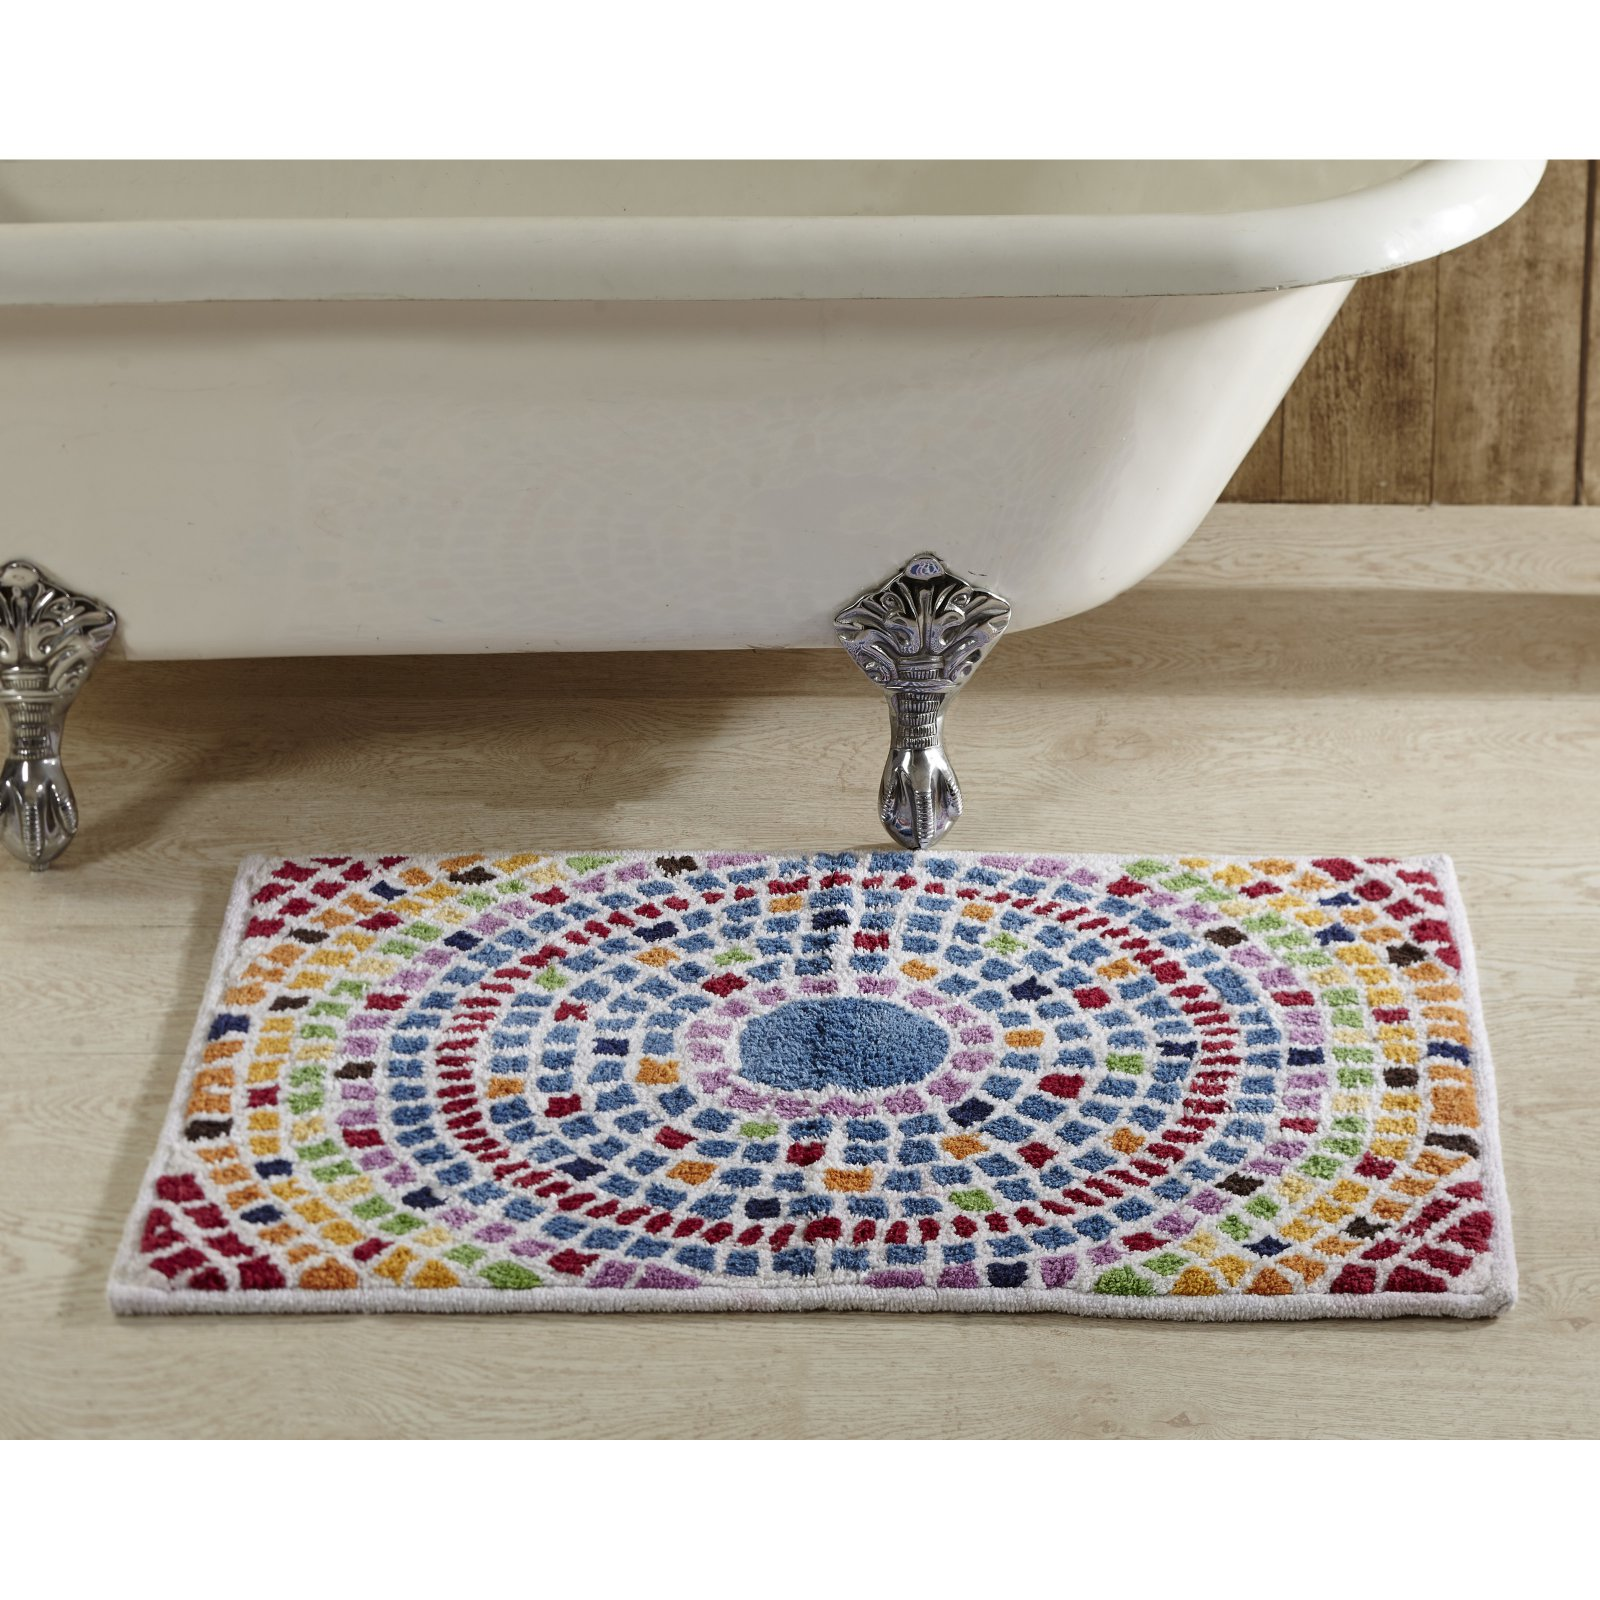 "Picasso Mosaic 30"" x 48"" Bath Rug, Multi"